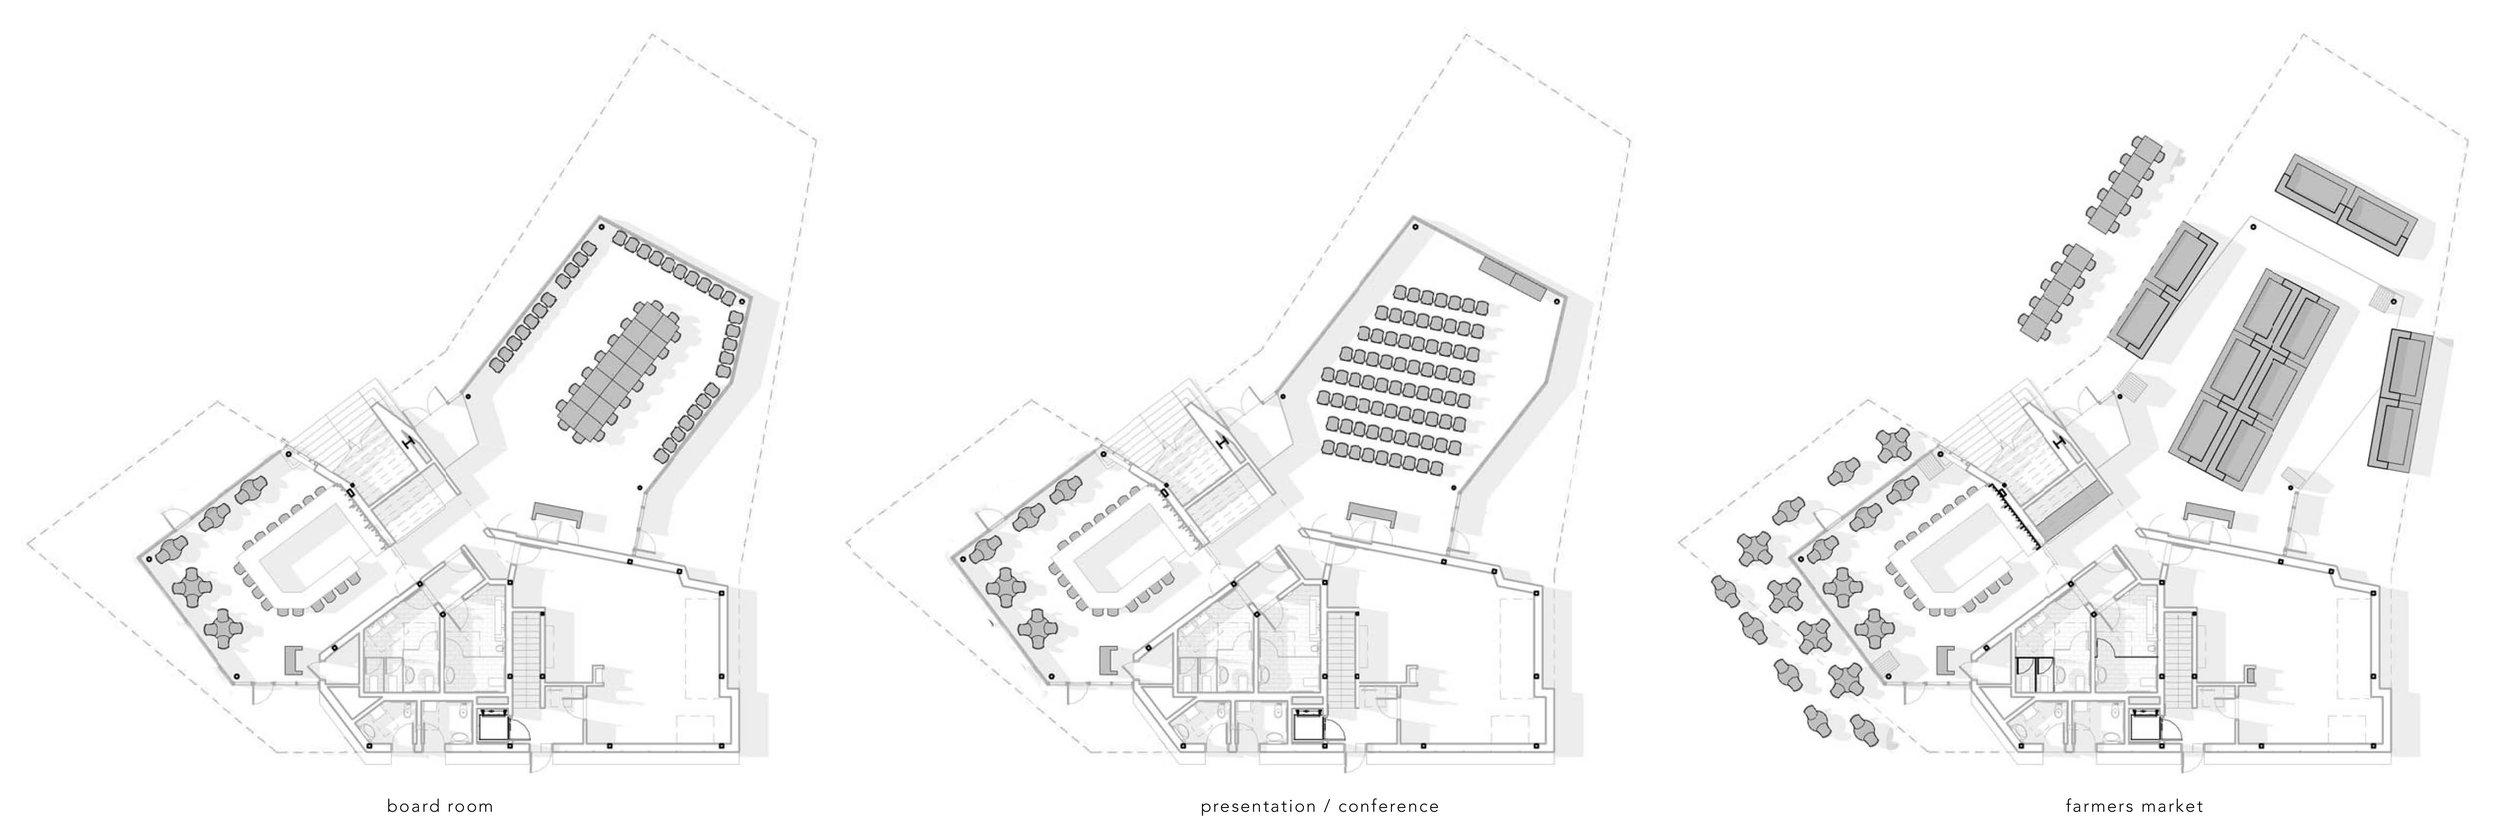 18--0824_Lumen Flexible Plan 2.jpg